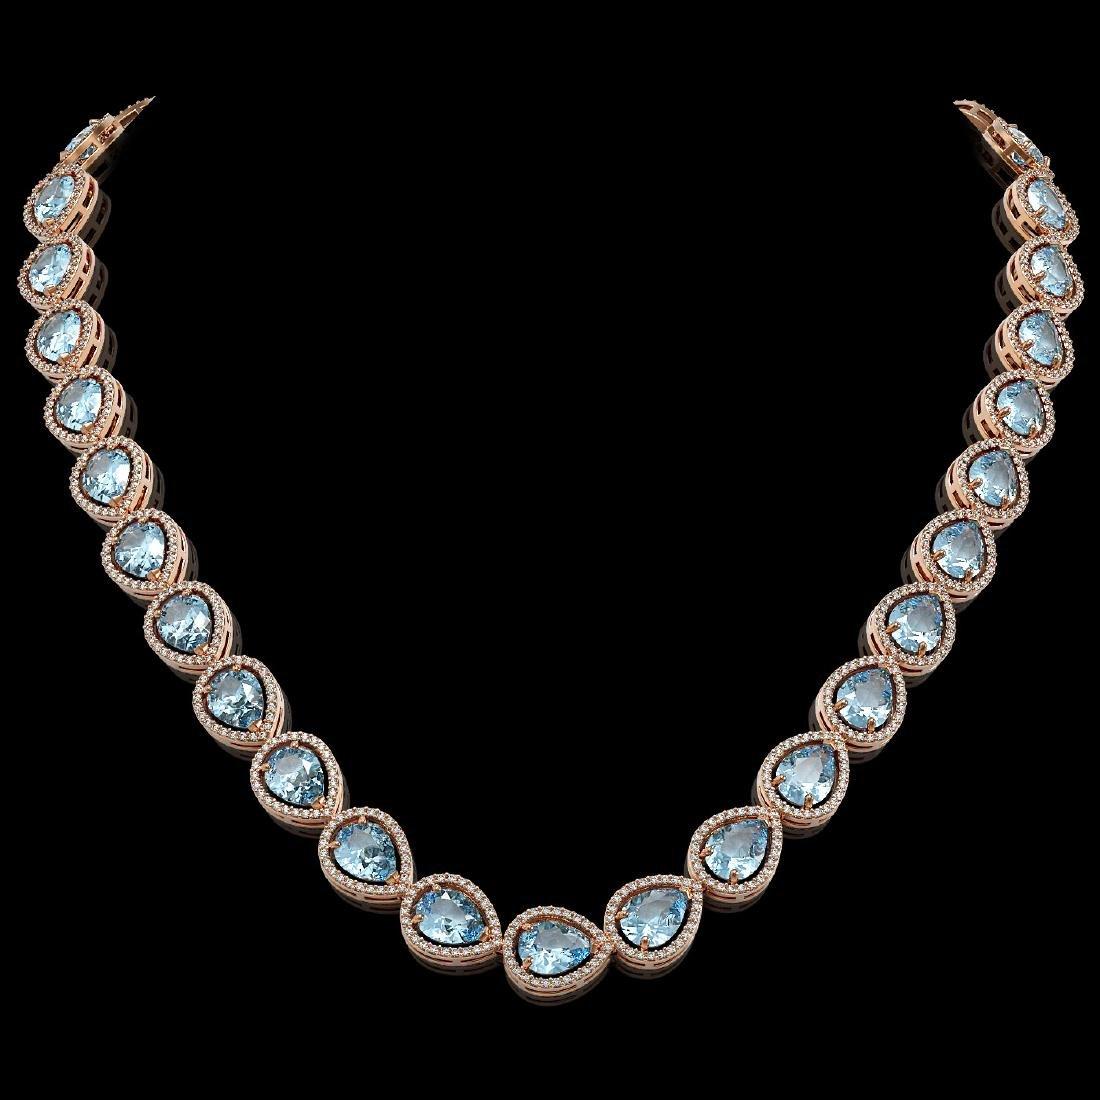 41.6 CTW Aquamarine & Diamond Halo Necklace 10K Rose